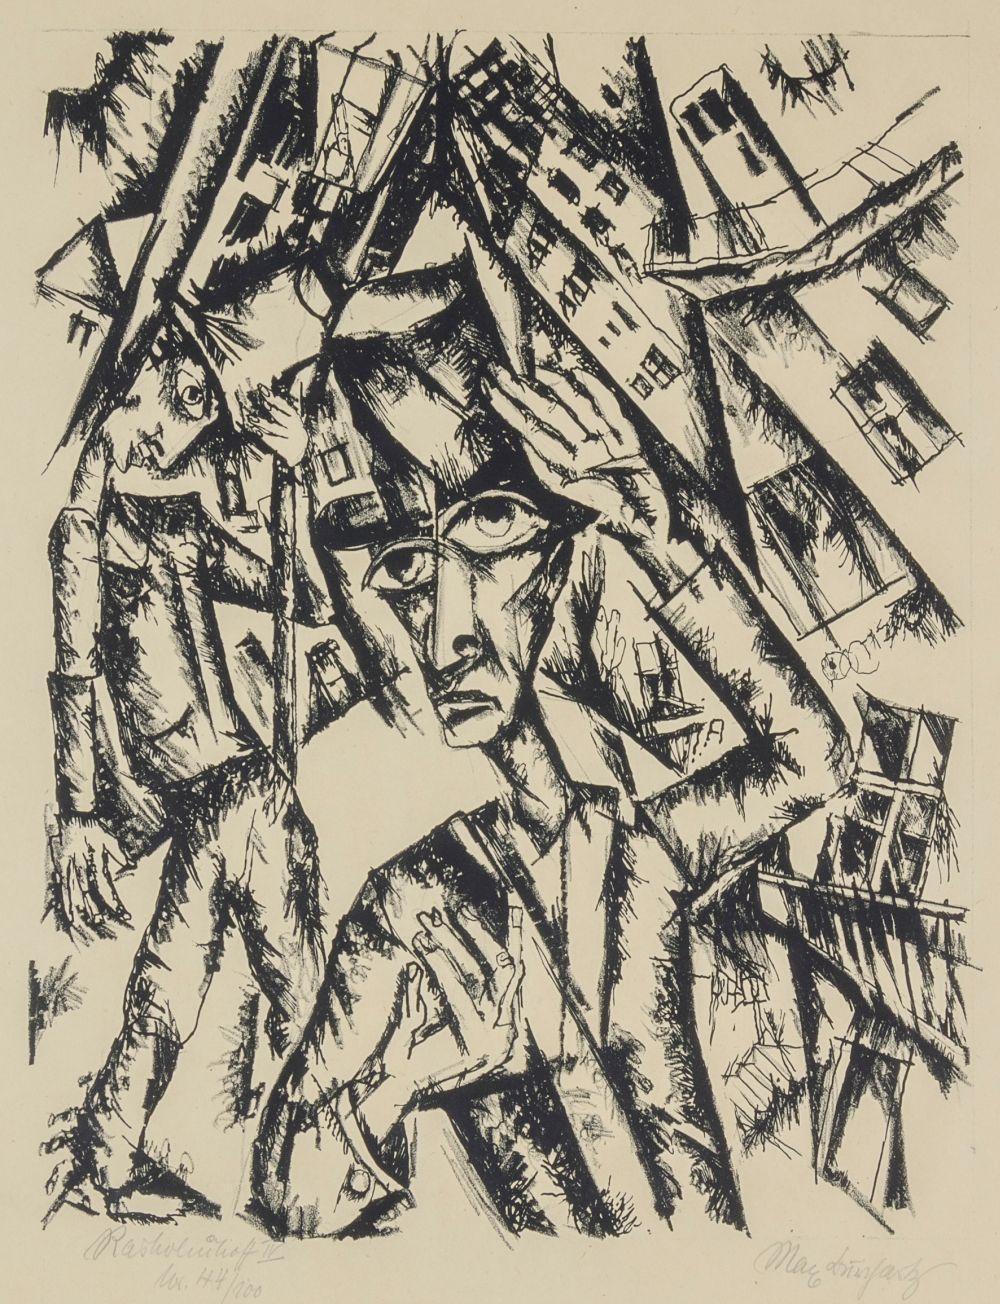 Expressionismus - Burchartz, Max